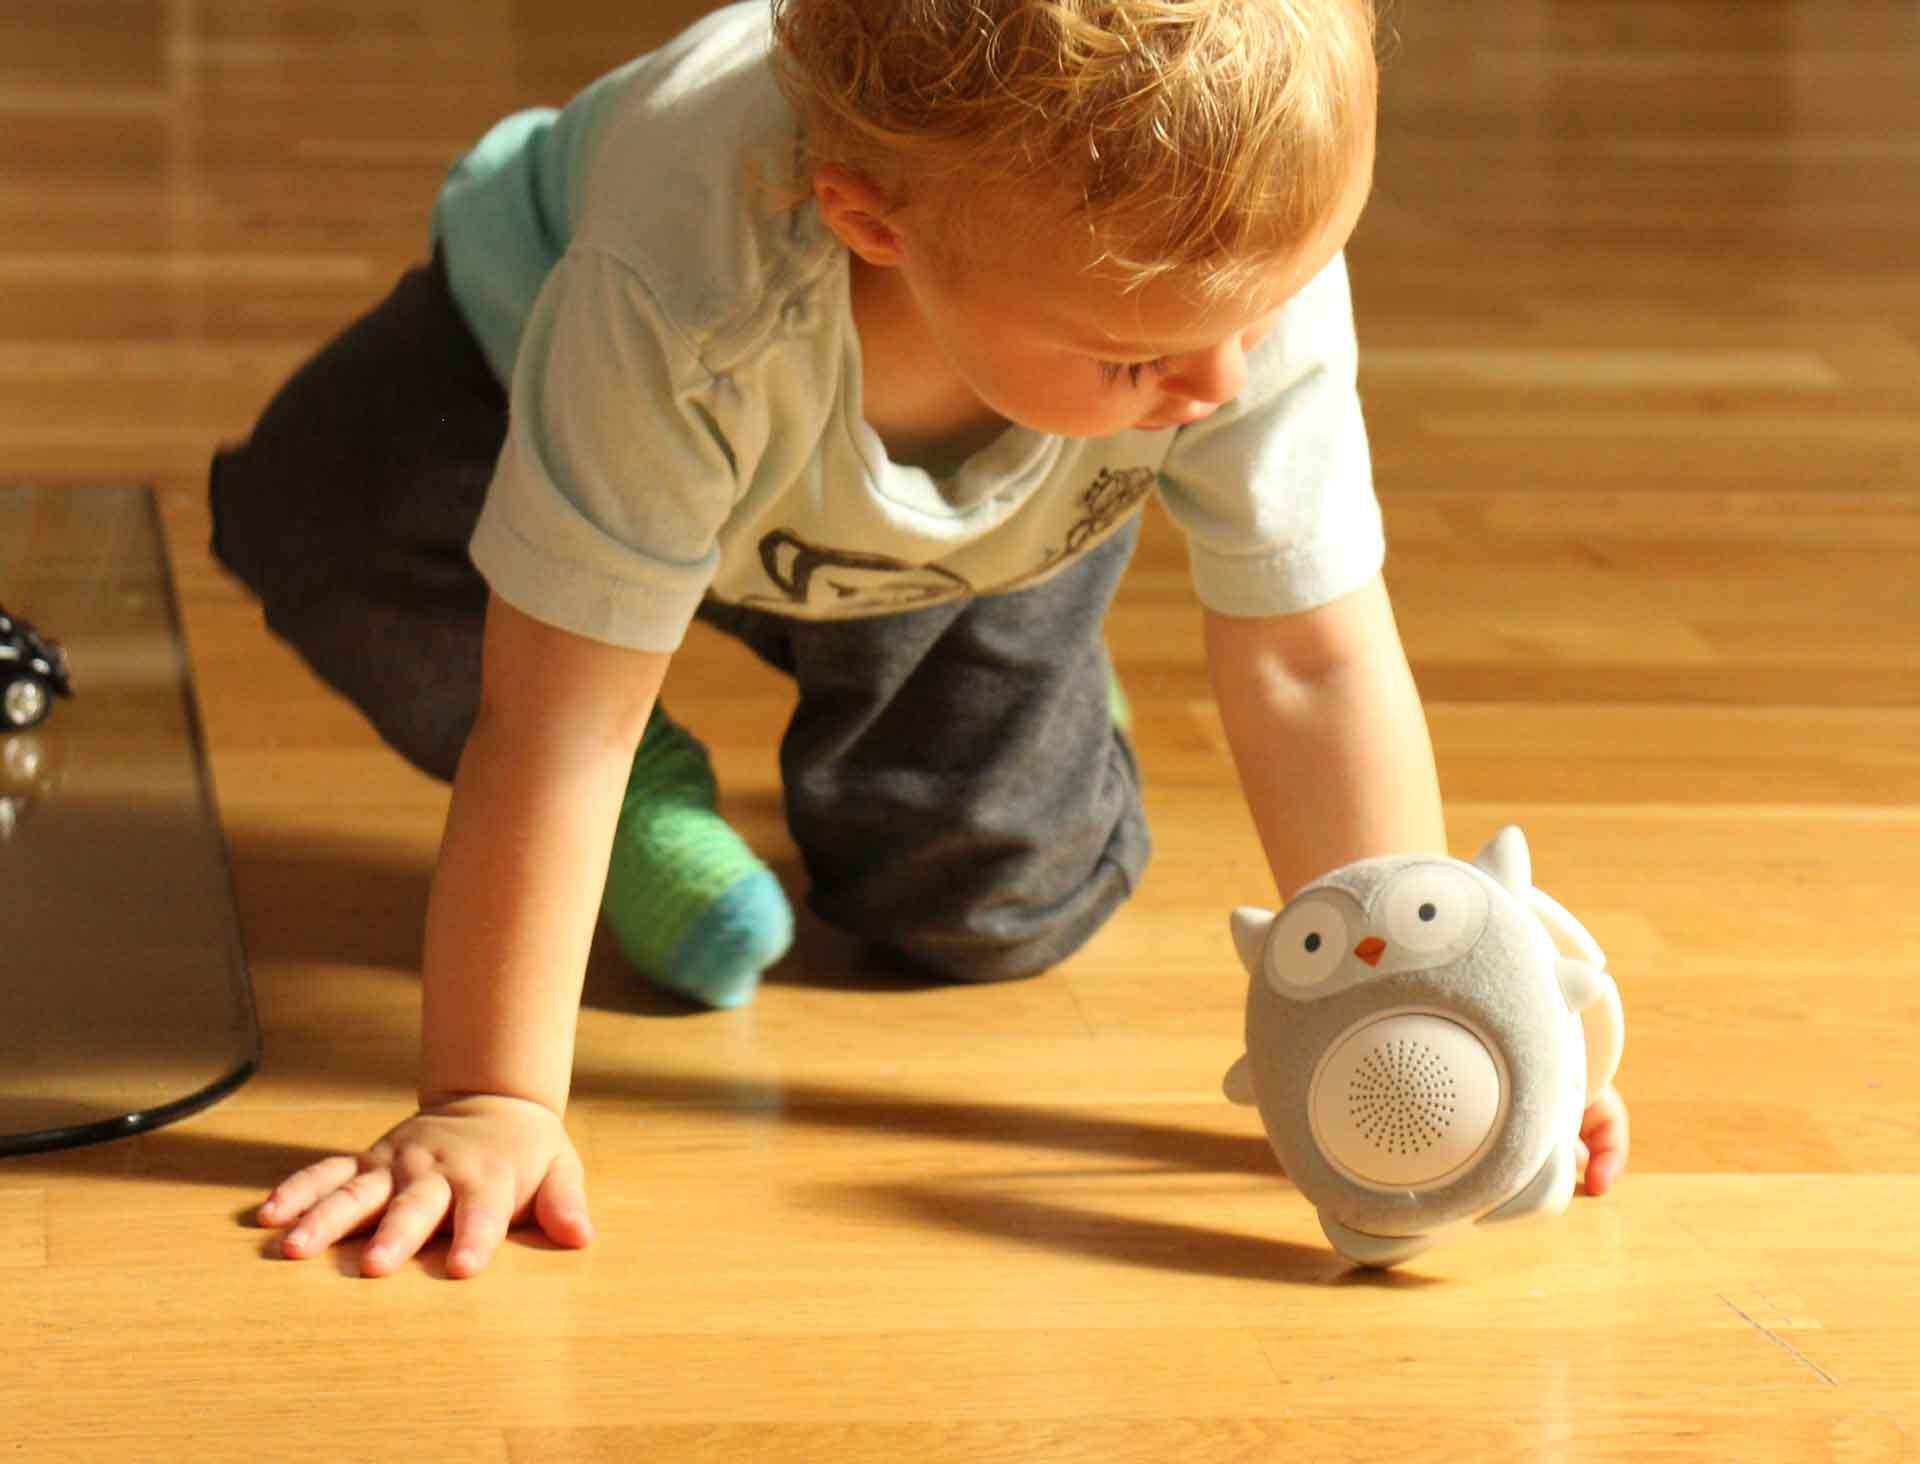 White noise machine for toddler travel